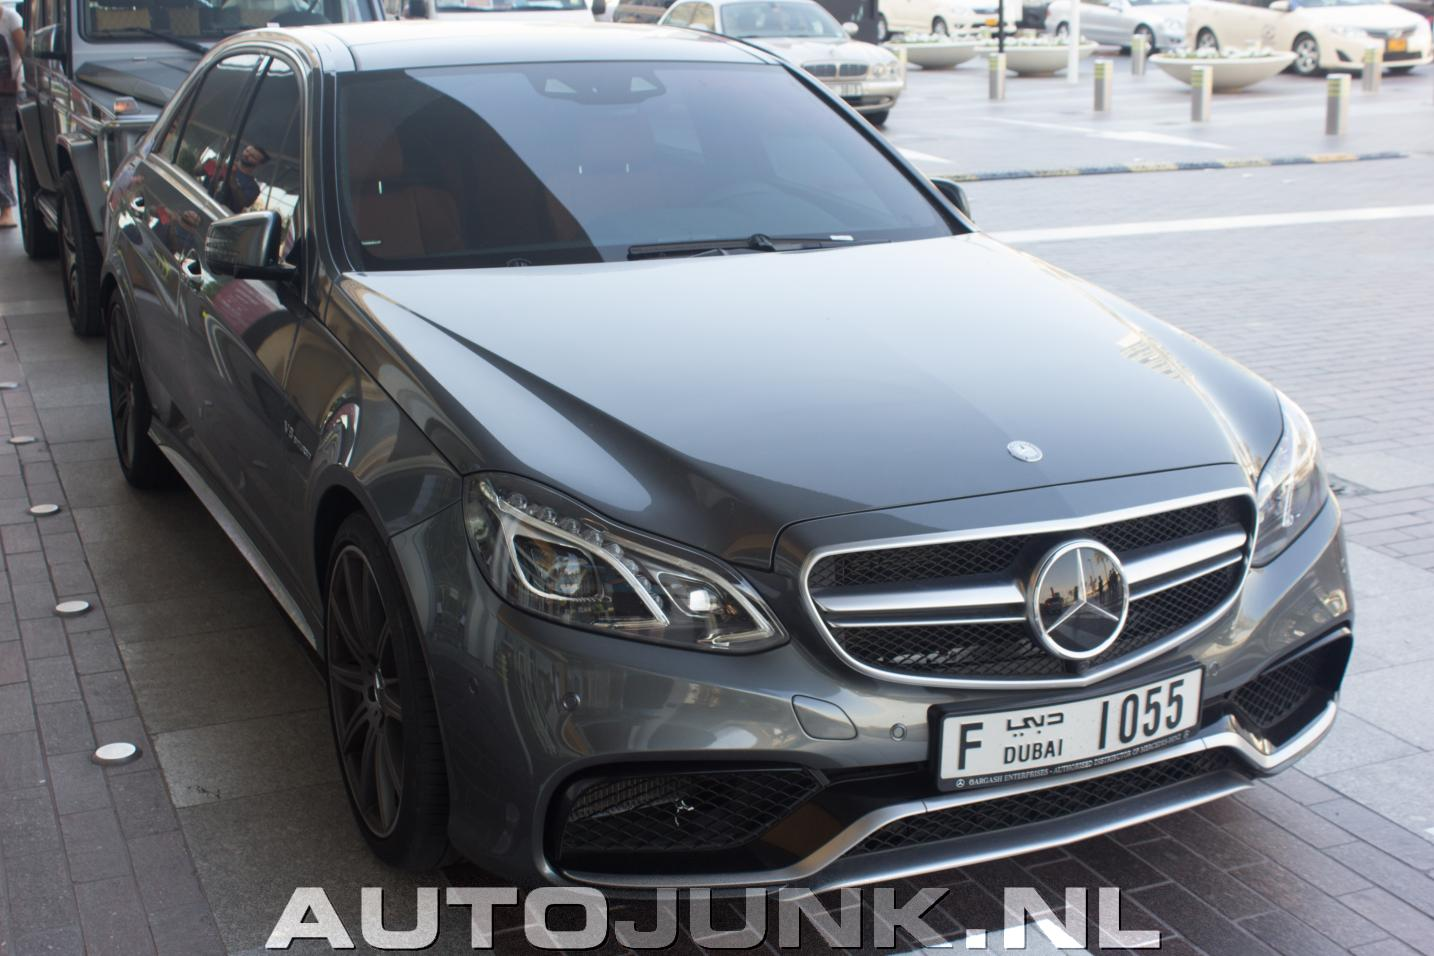 Mercedes benz e63 amg s model foto 39 s 127263 for Different models of mercedes benz